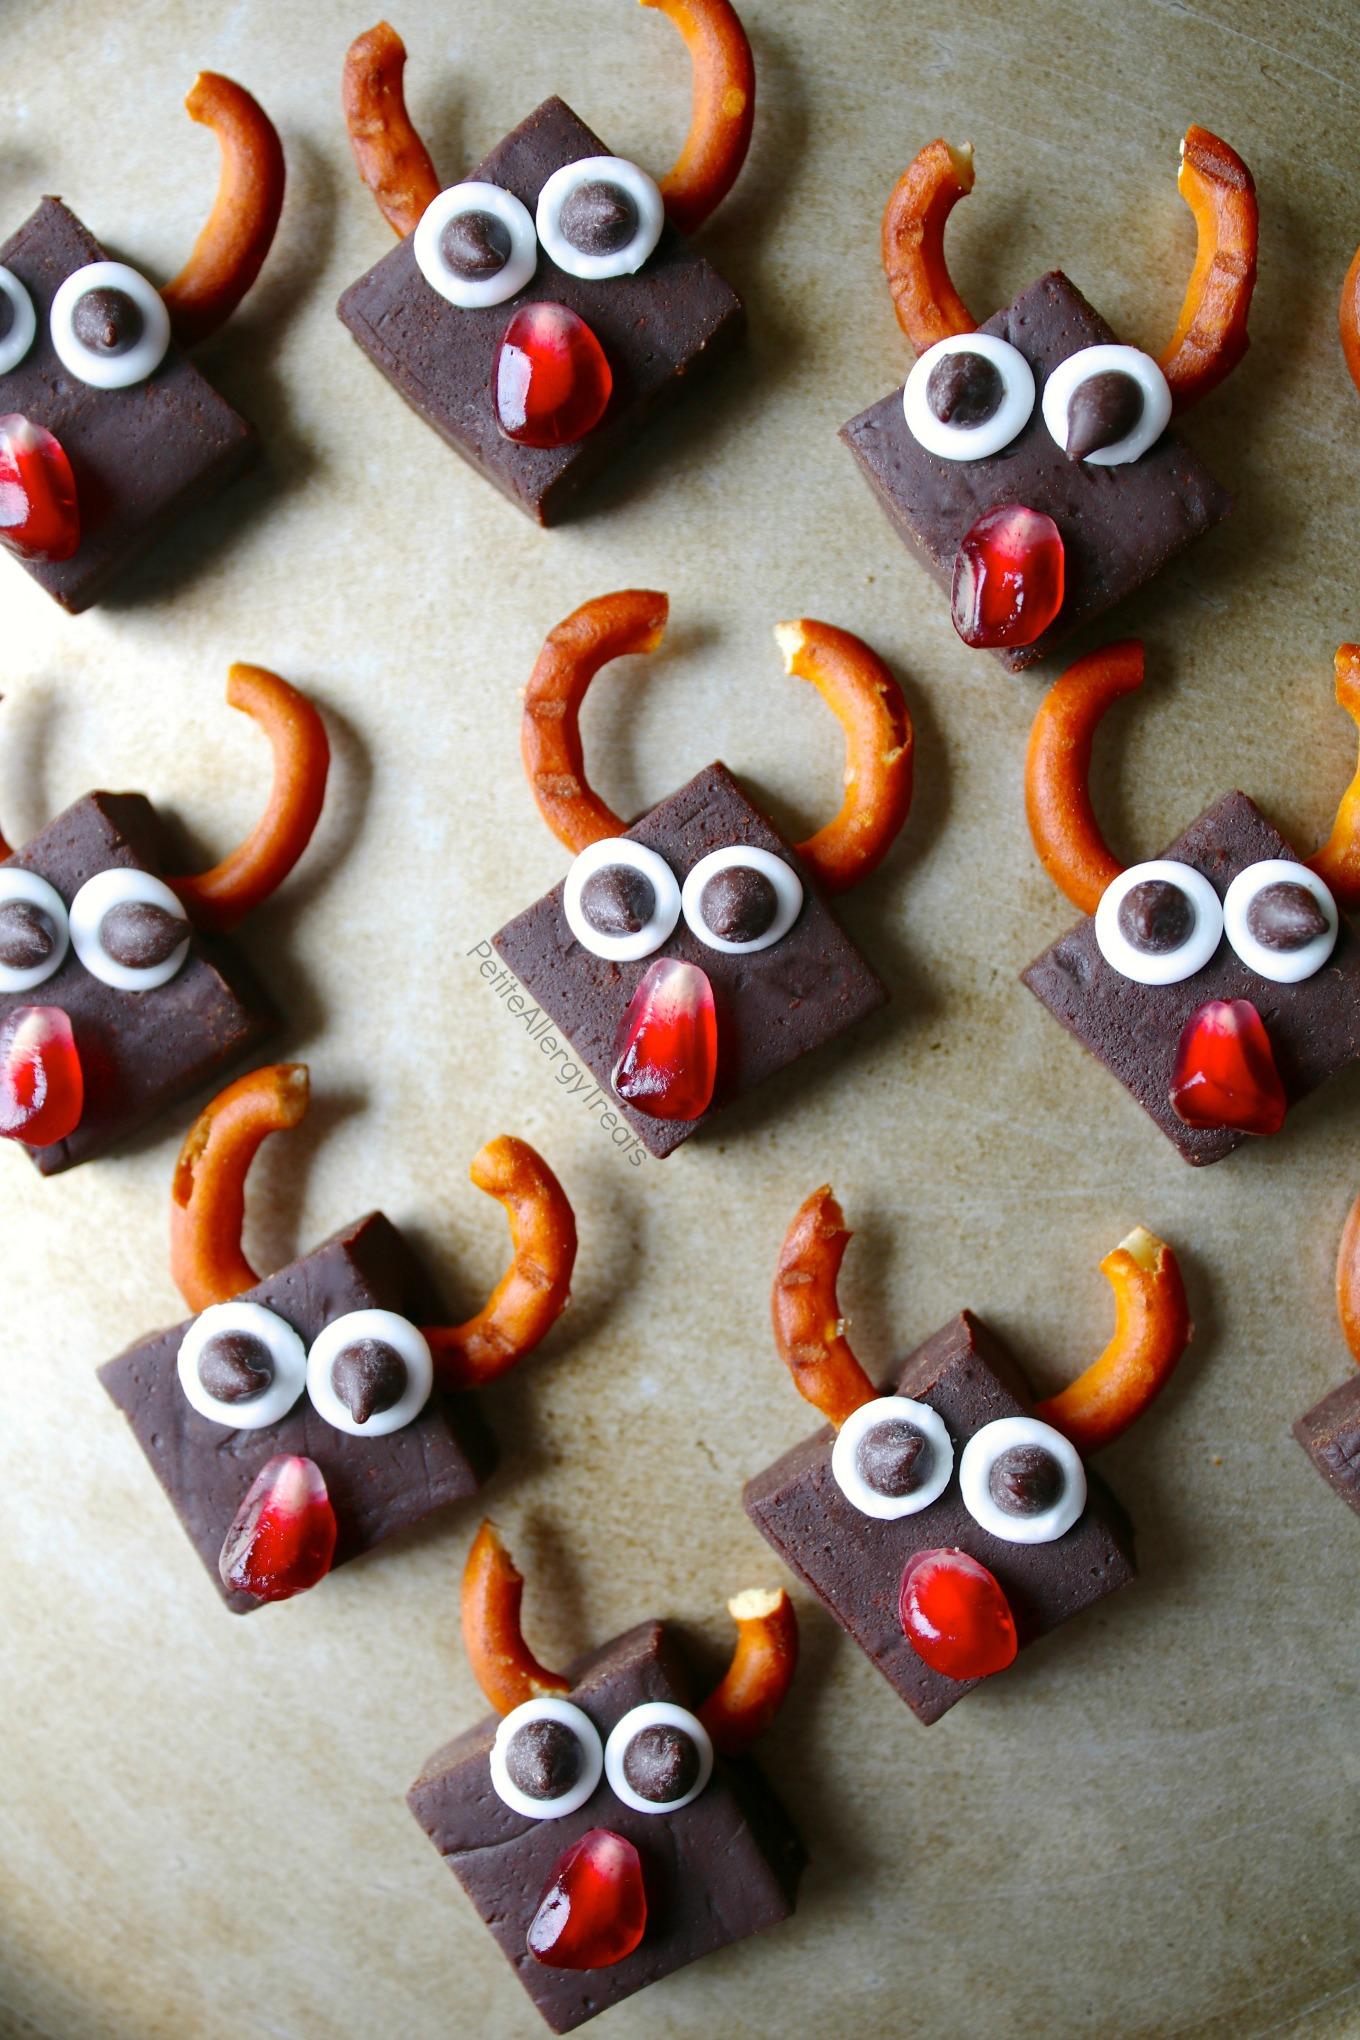 No Bake Dairy Free Fudge Reindeer Recipe (vegan gluten free)- Healthy chocolate fudge (with vegetables) for Christmas! Dye free gluten free and food allergy friendly